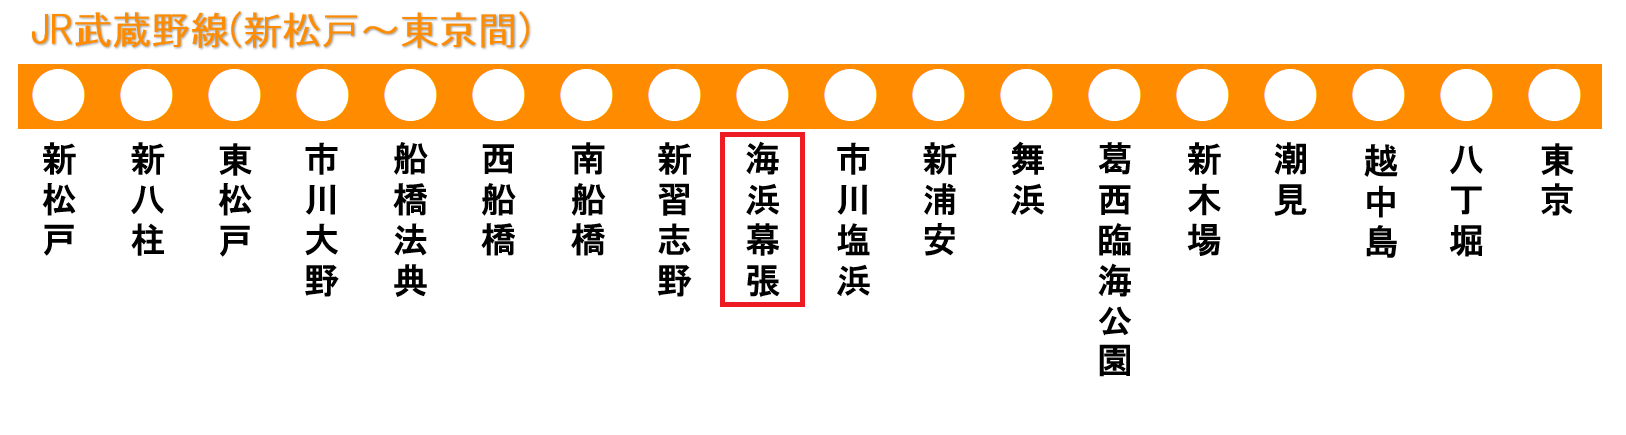 JR武蔵野線の路線図(海浜幕張駅)